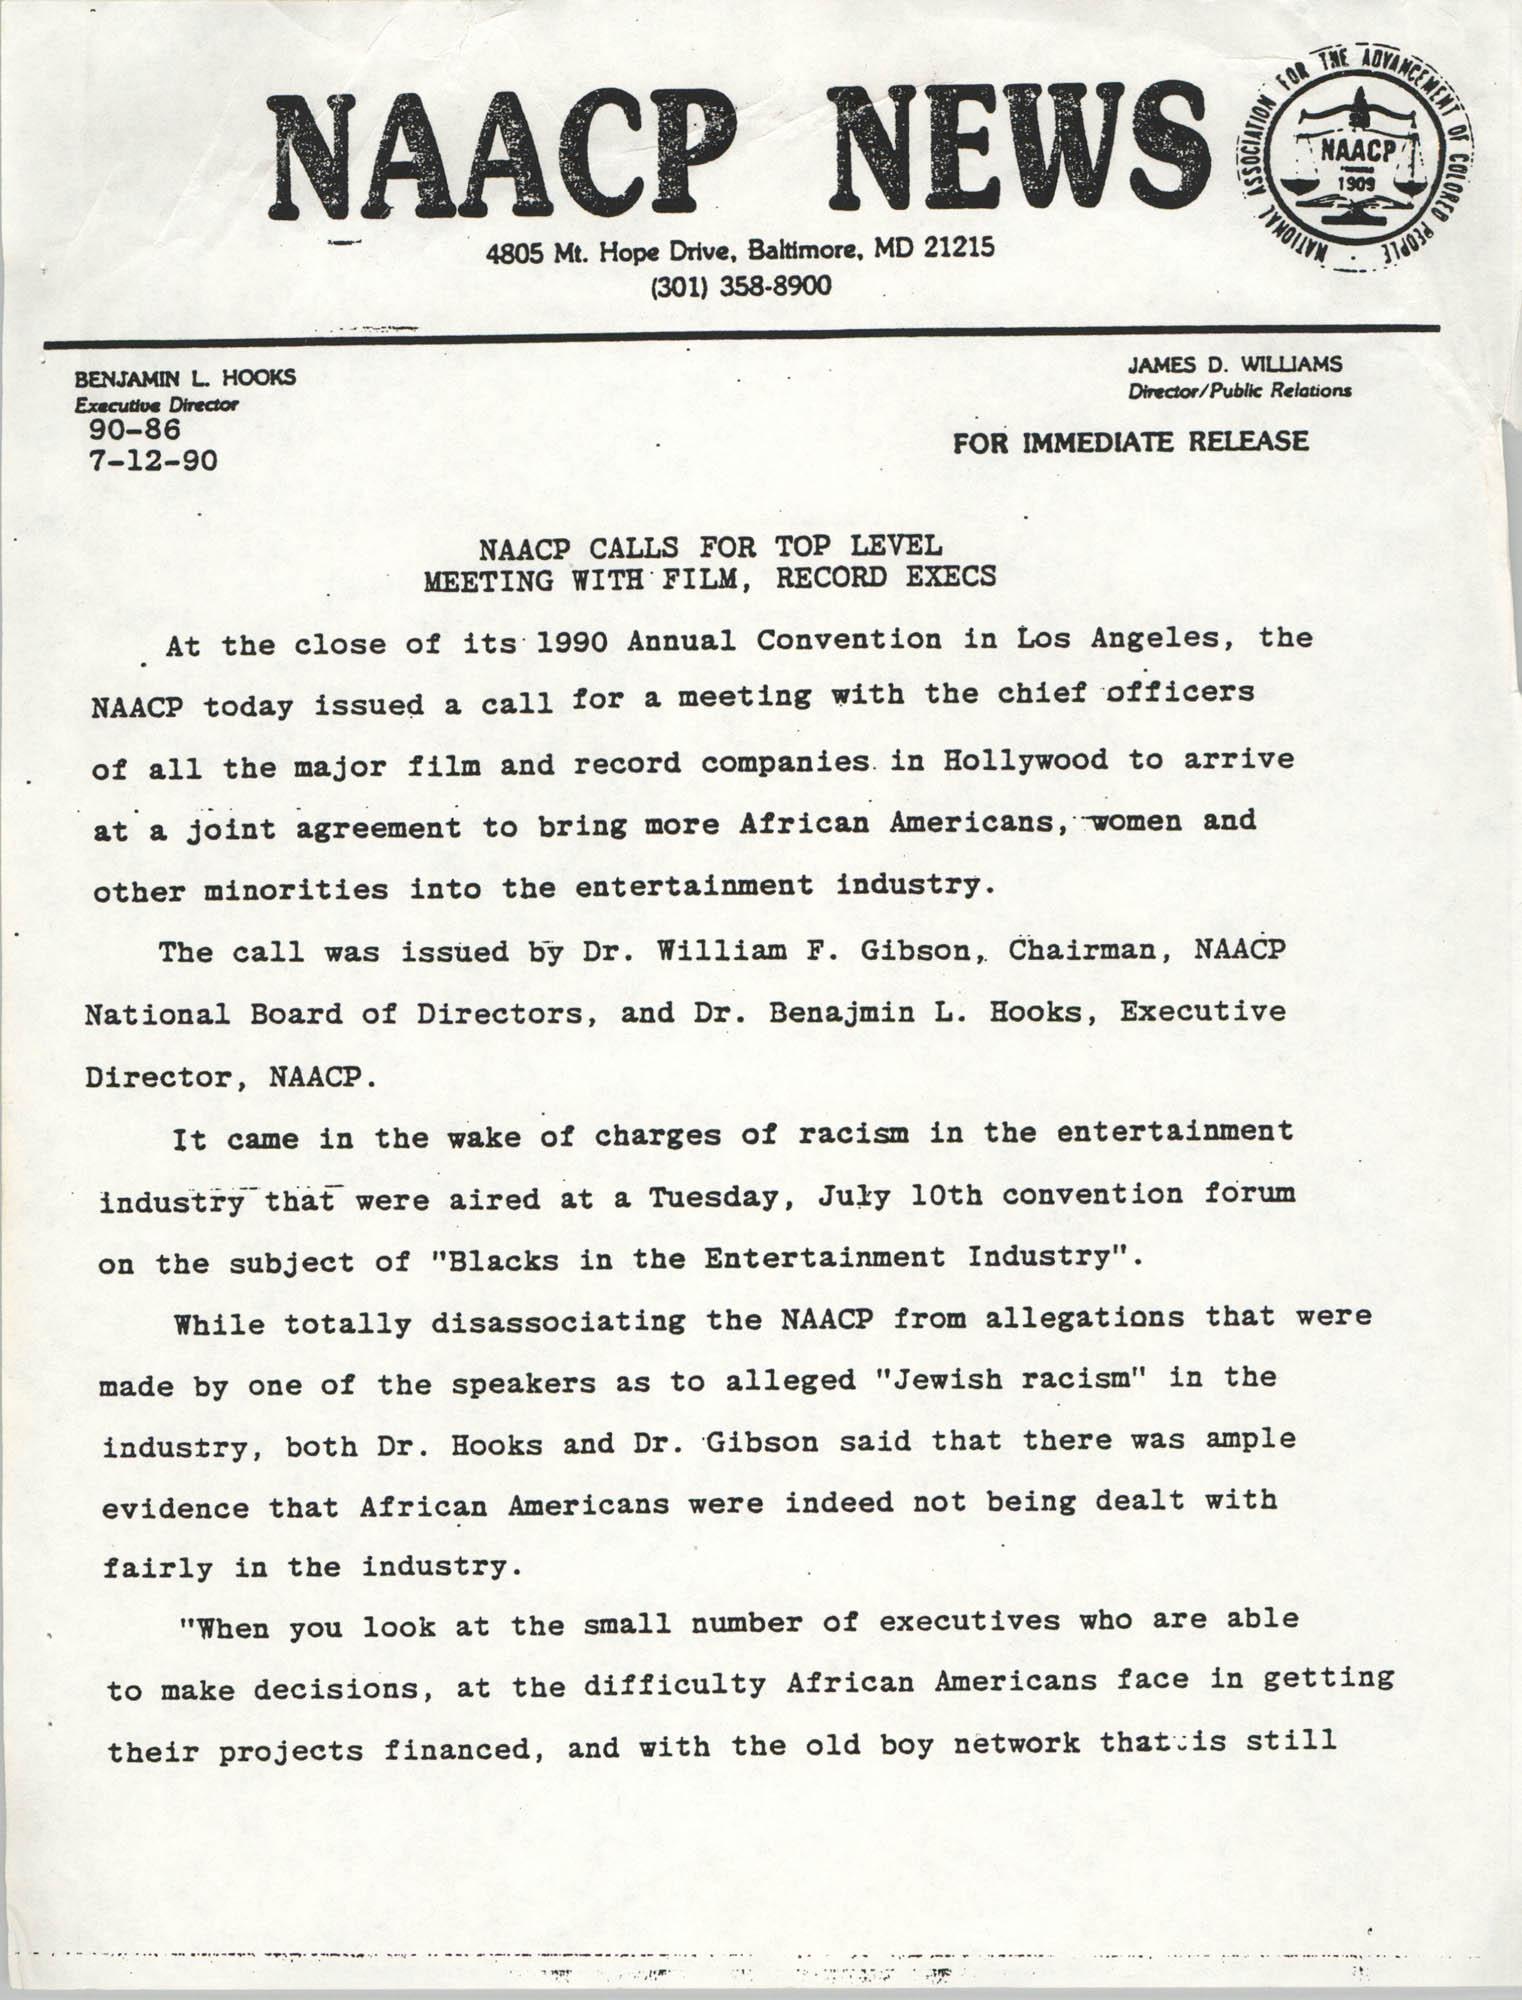 NAACP News Statement, July 12, 1990